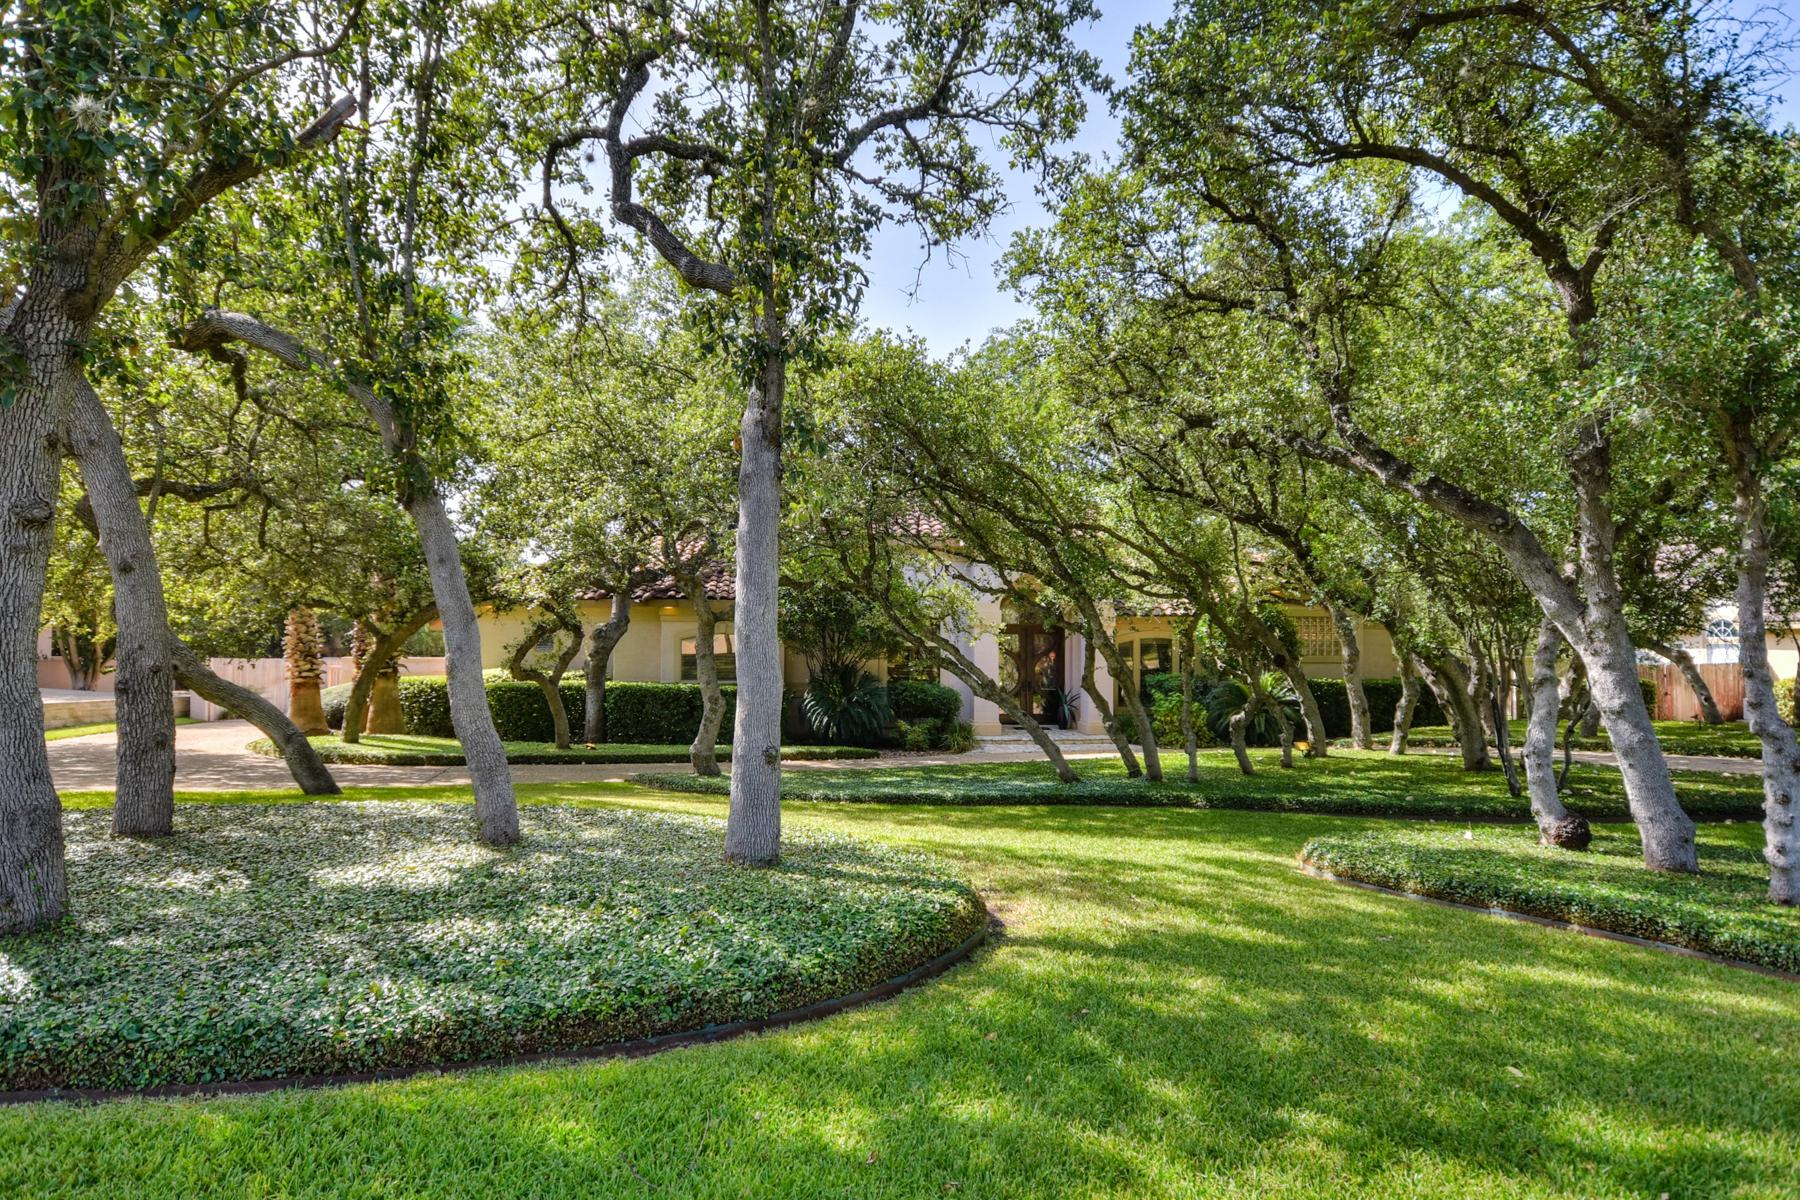 獨棟家庭住宅 為 出售 在 Custom One-Story Home in Shavano Park 310 Harvard Oak Shavano Creek, San Antonio, 德克薩斯州, 78230 美國